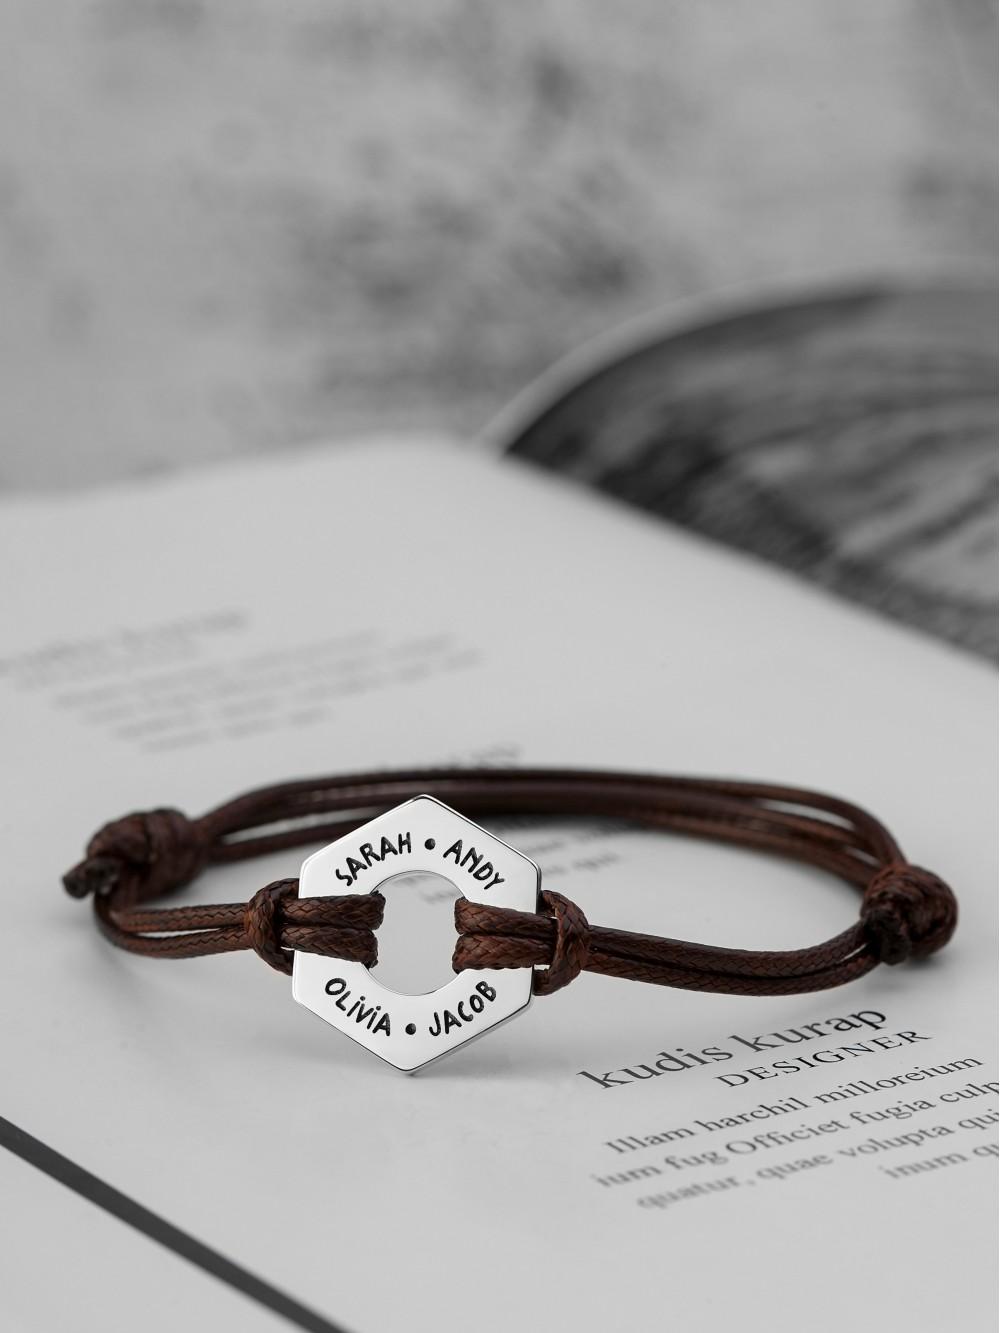 Men's Bracelet With Names - Hex Nut